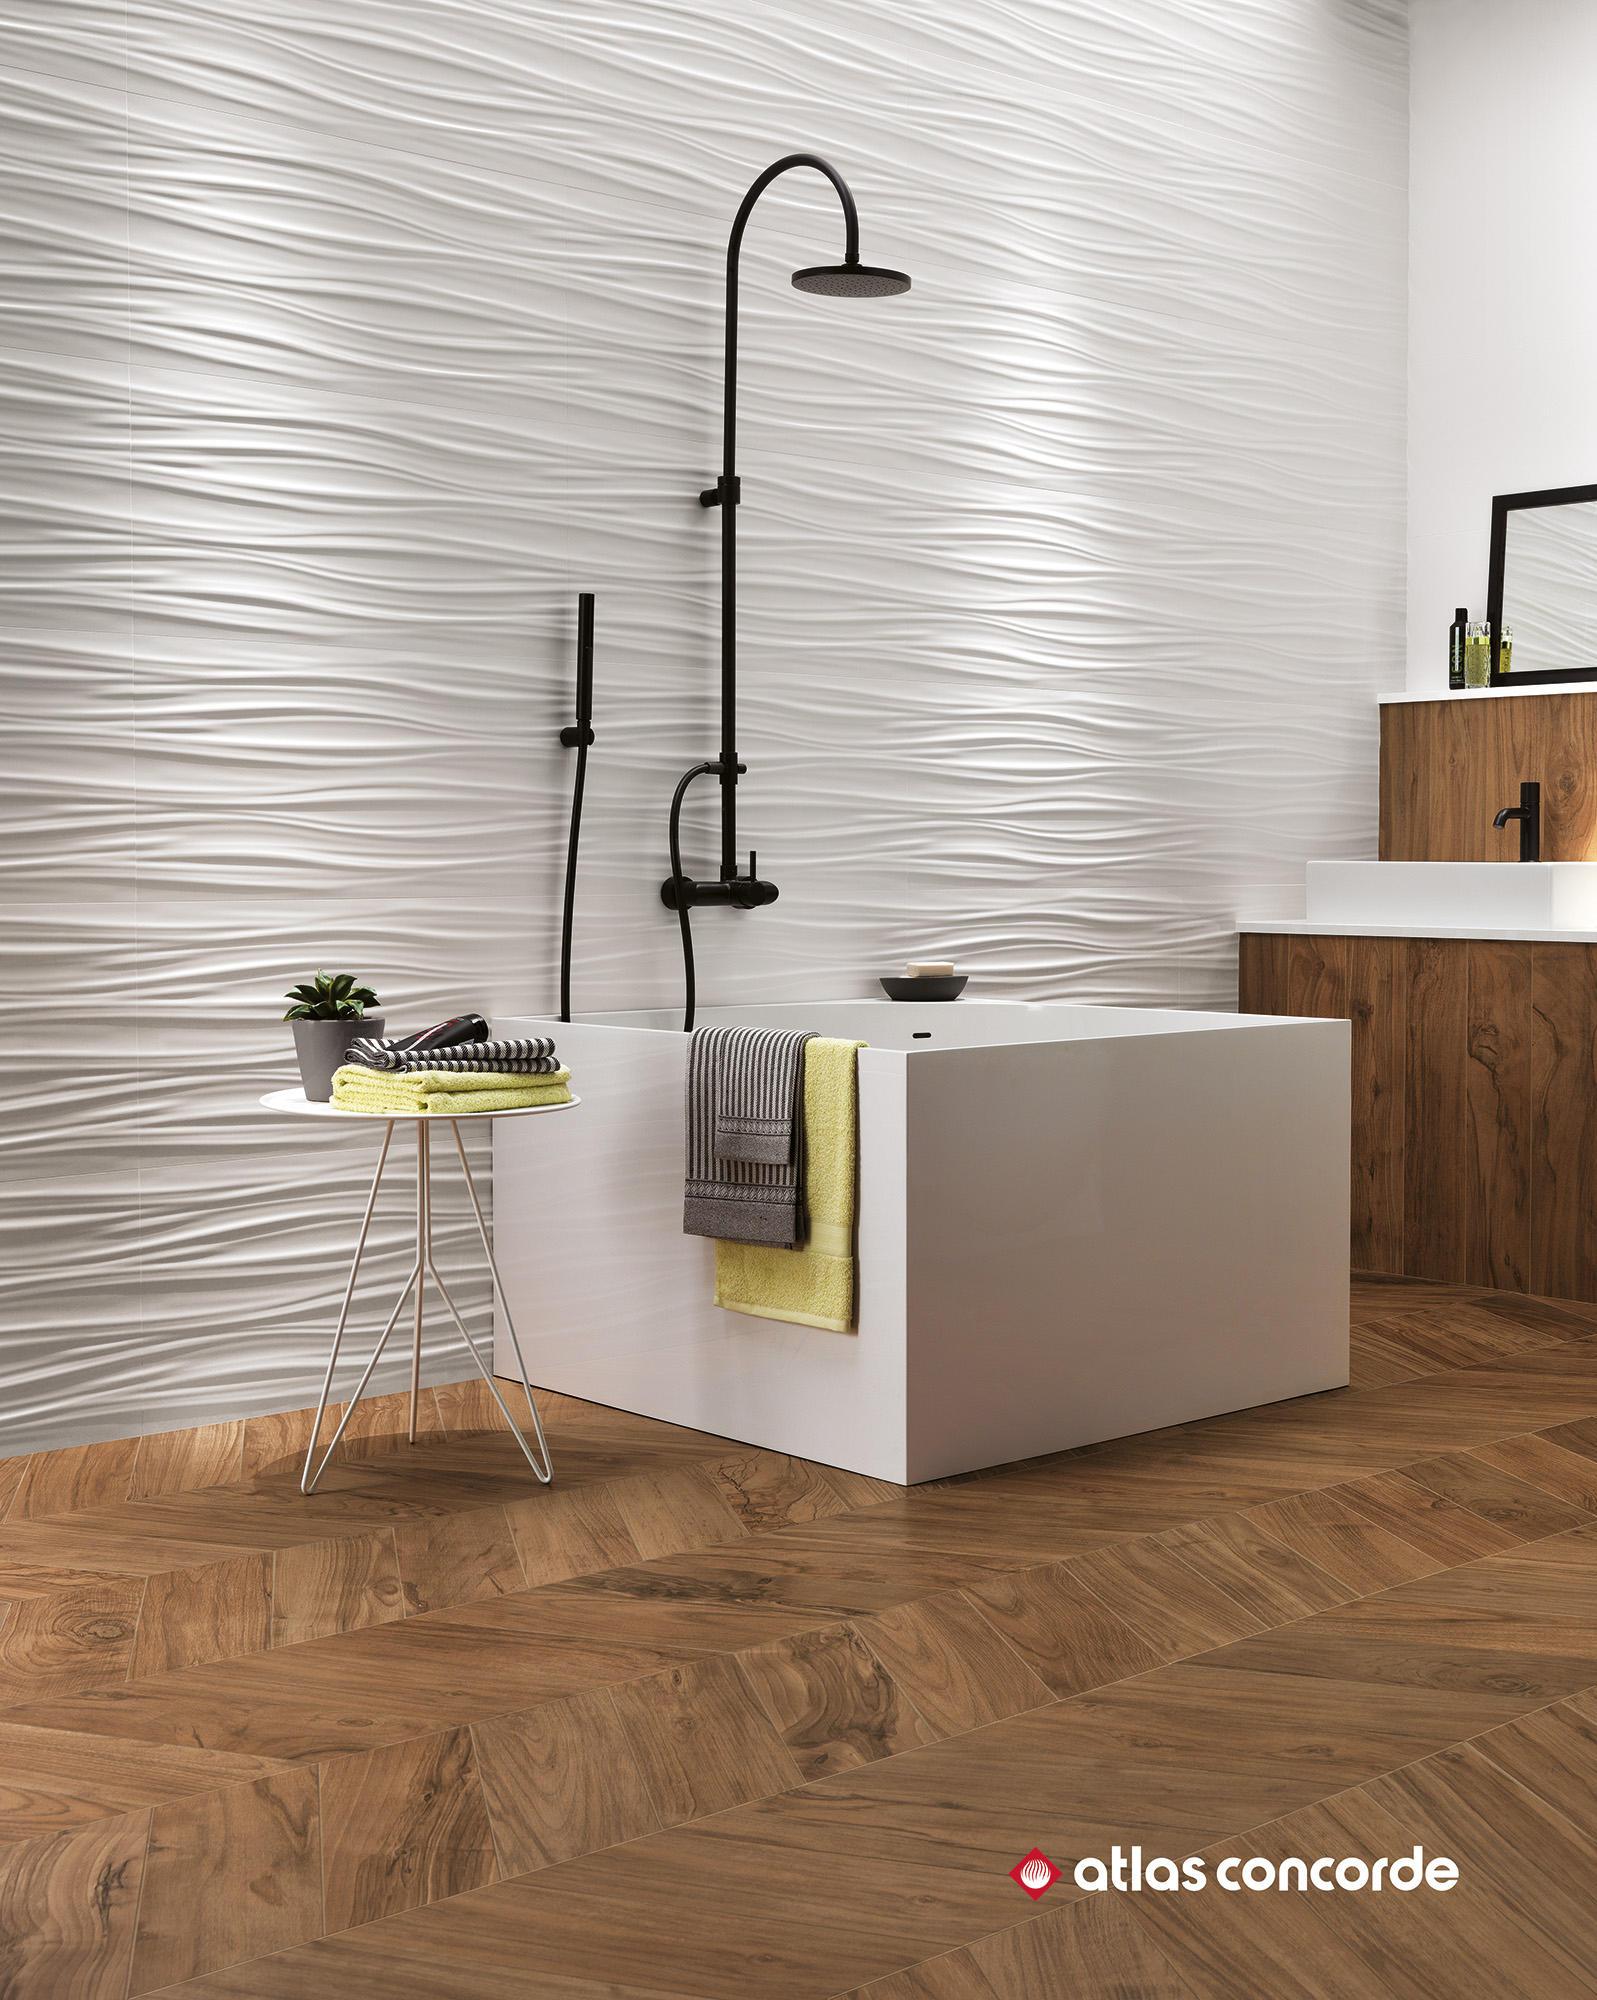 3d wall dune sand ceramic tiles from atlas concorde architonic - Atlas concorde bagno ...